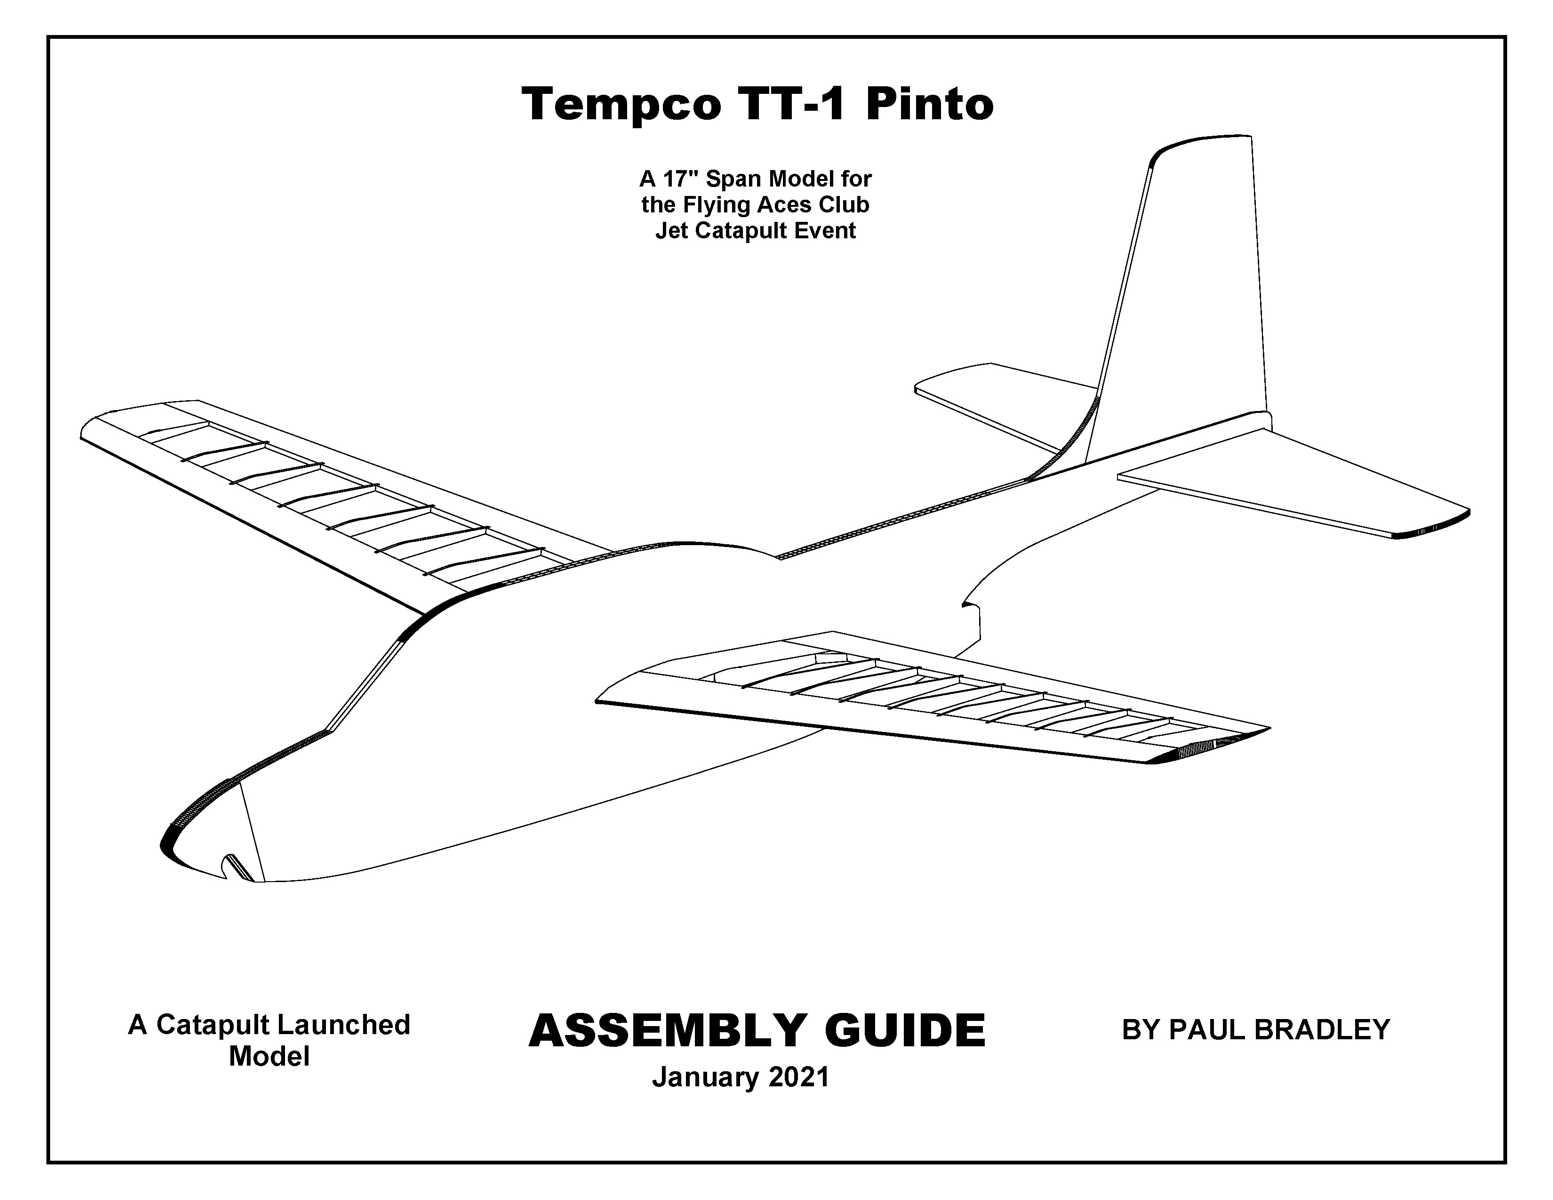 https://0201.nccdn.net/1_2/000/000/165/36f/pages-from-tempco-tt-1-jet-cat-assembly-guide.jpg